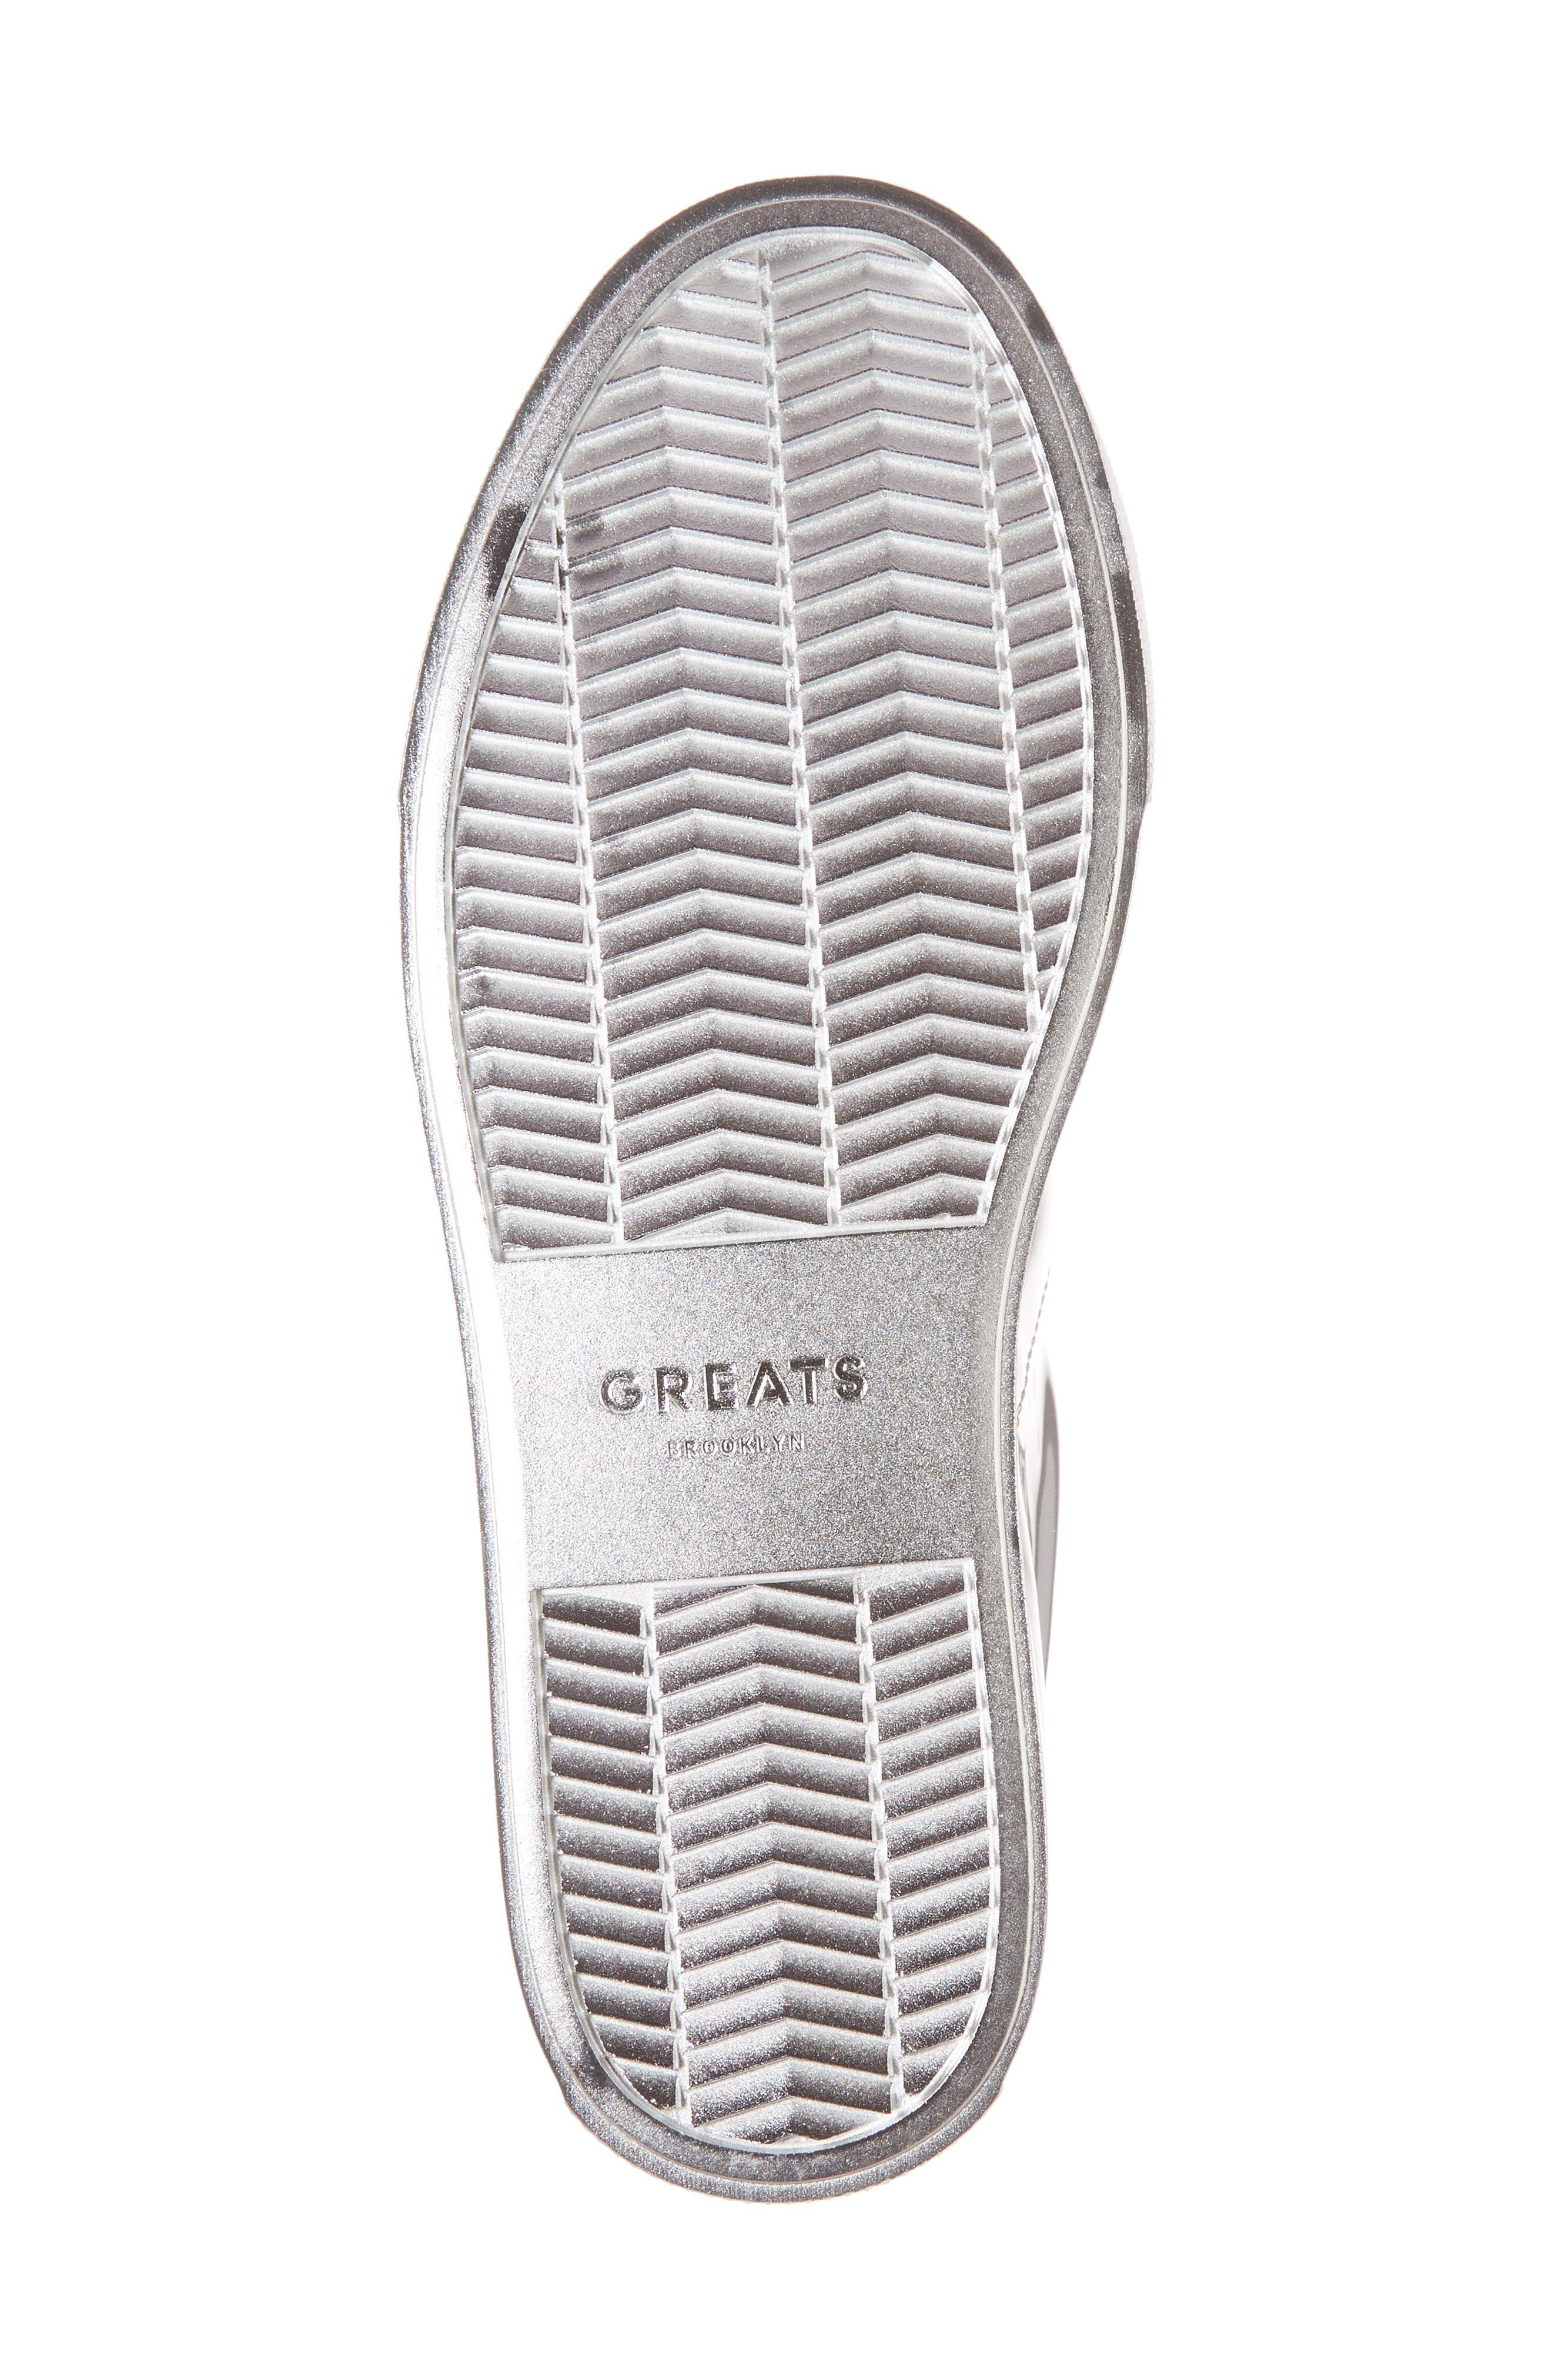 Royale Low Top Sneaker,                             Alternate thumbnail 6, color,                             Silver Tonal/ Flat Leather